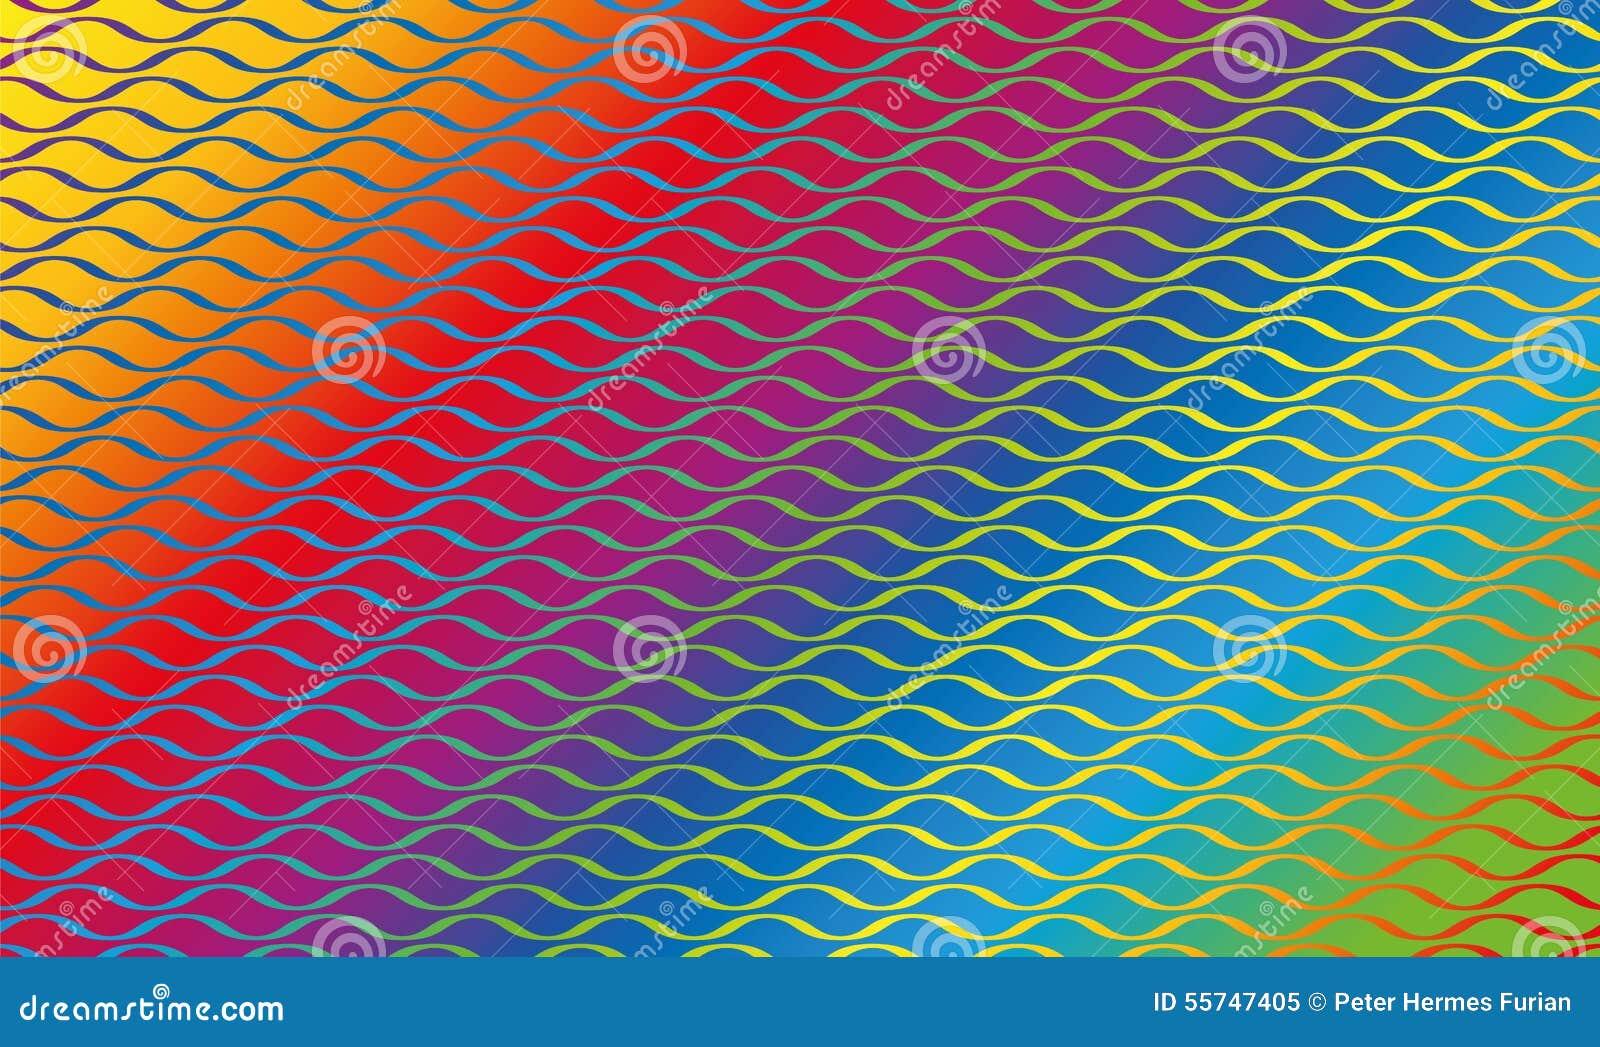 regenbogen muster bunte linien - photo #31